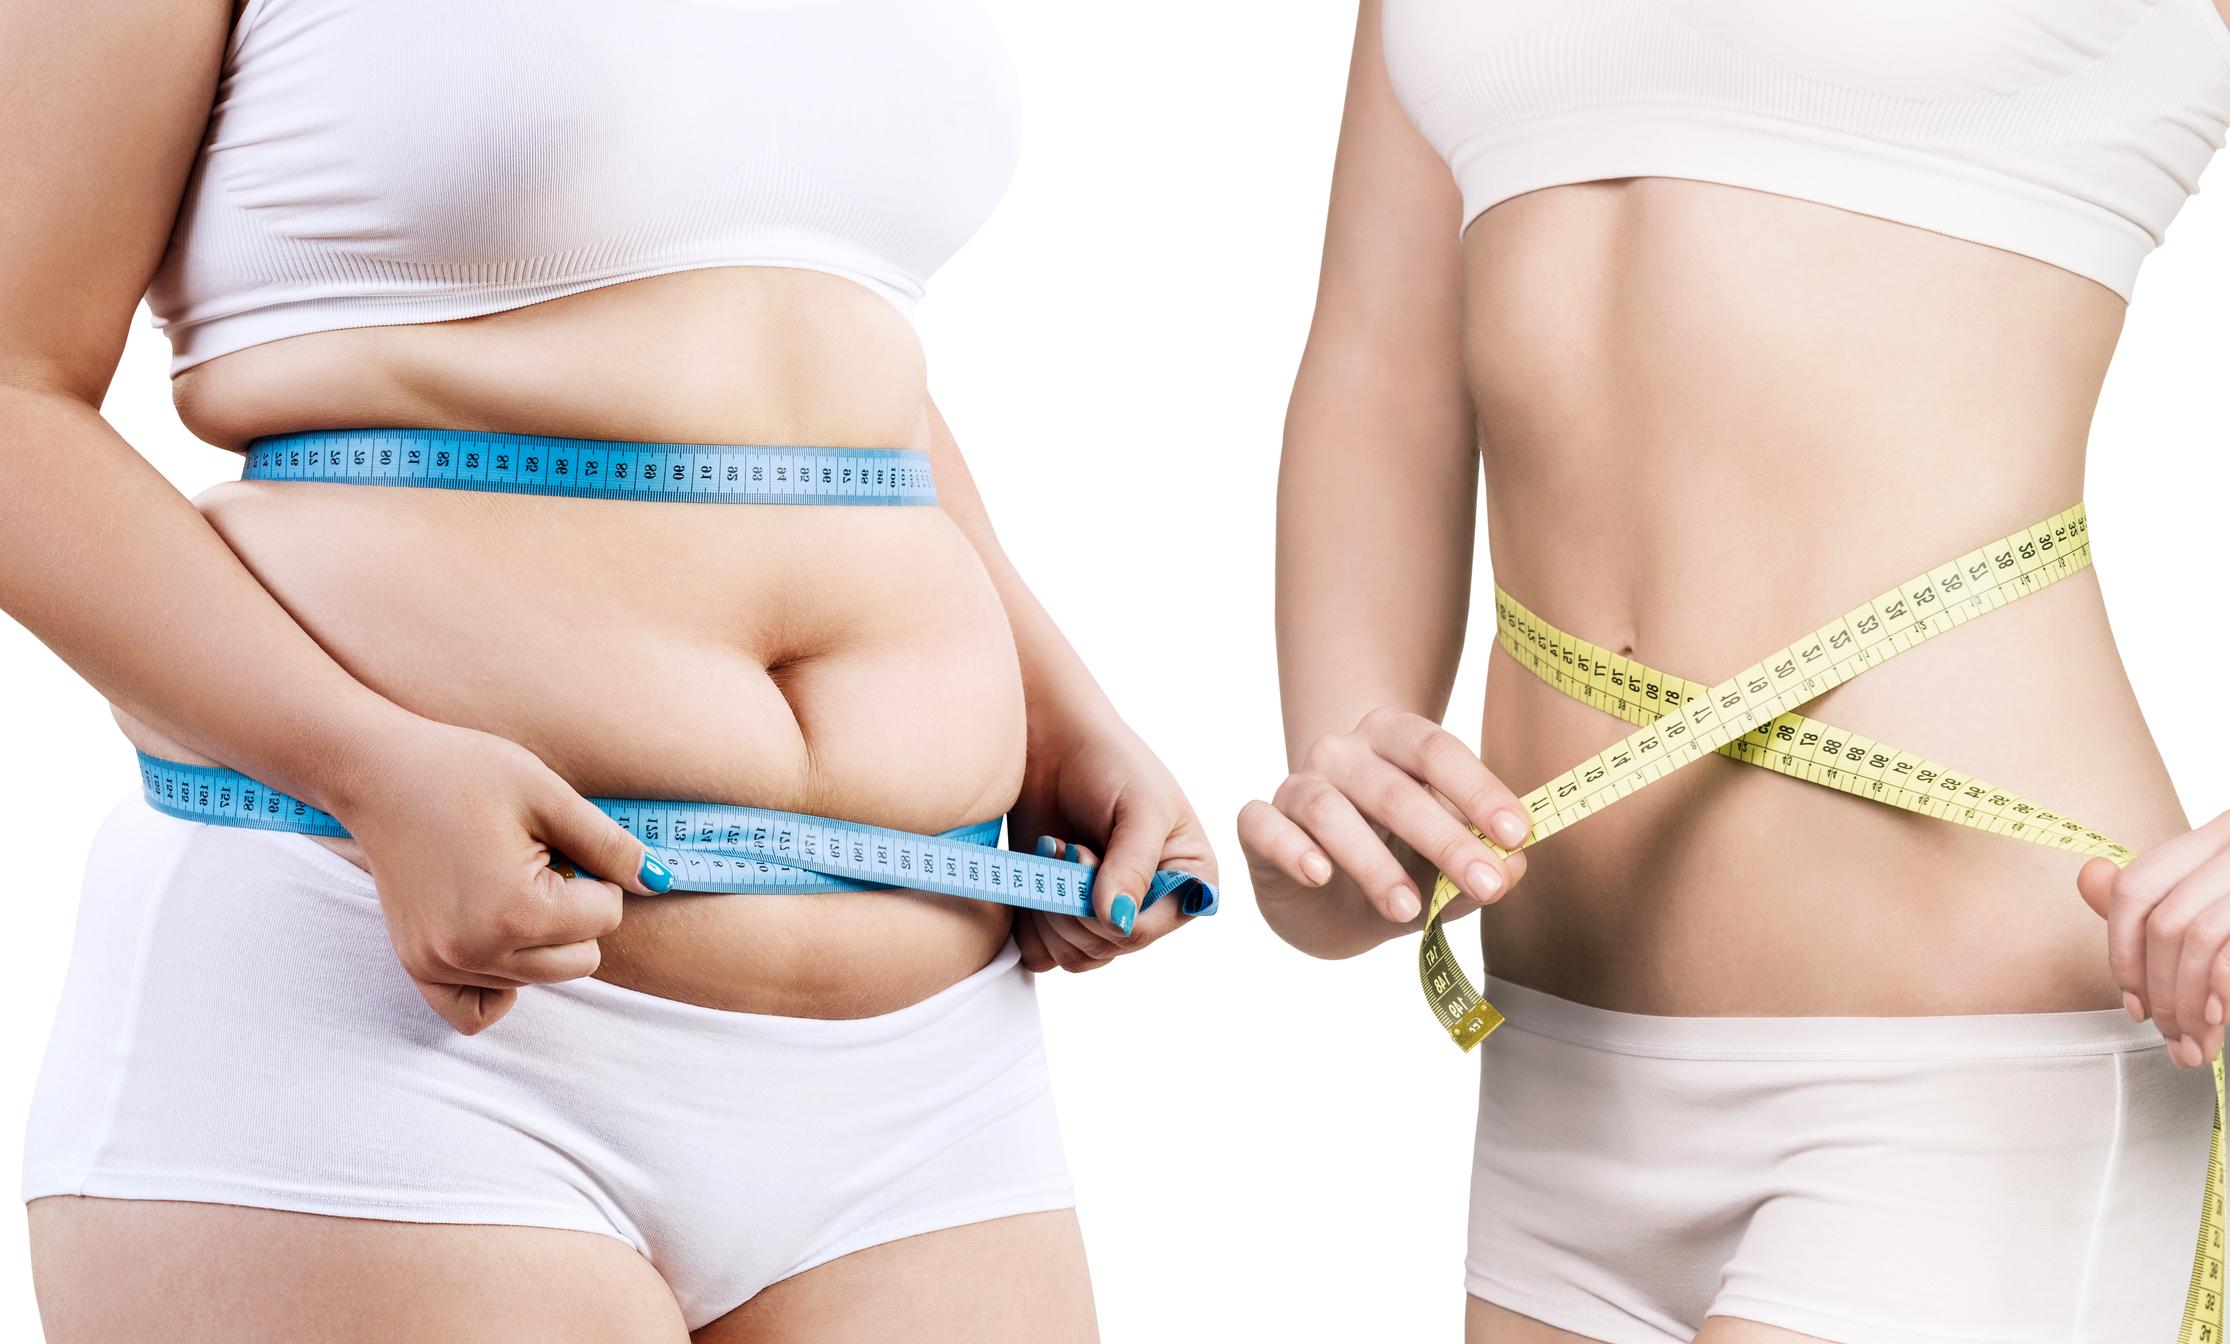 lefogy hasa kövér ember